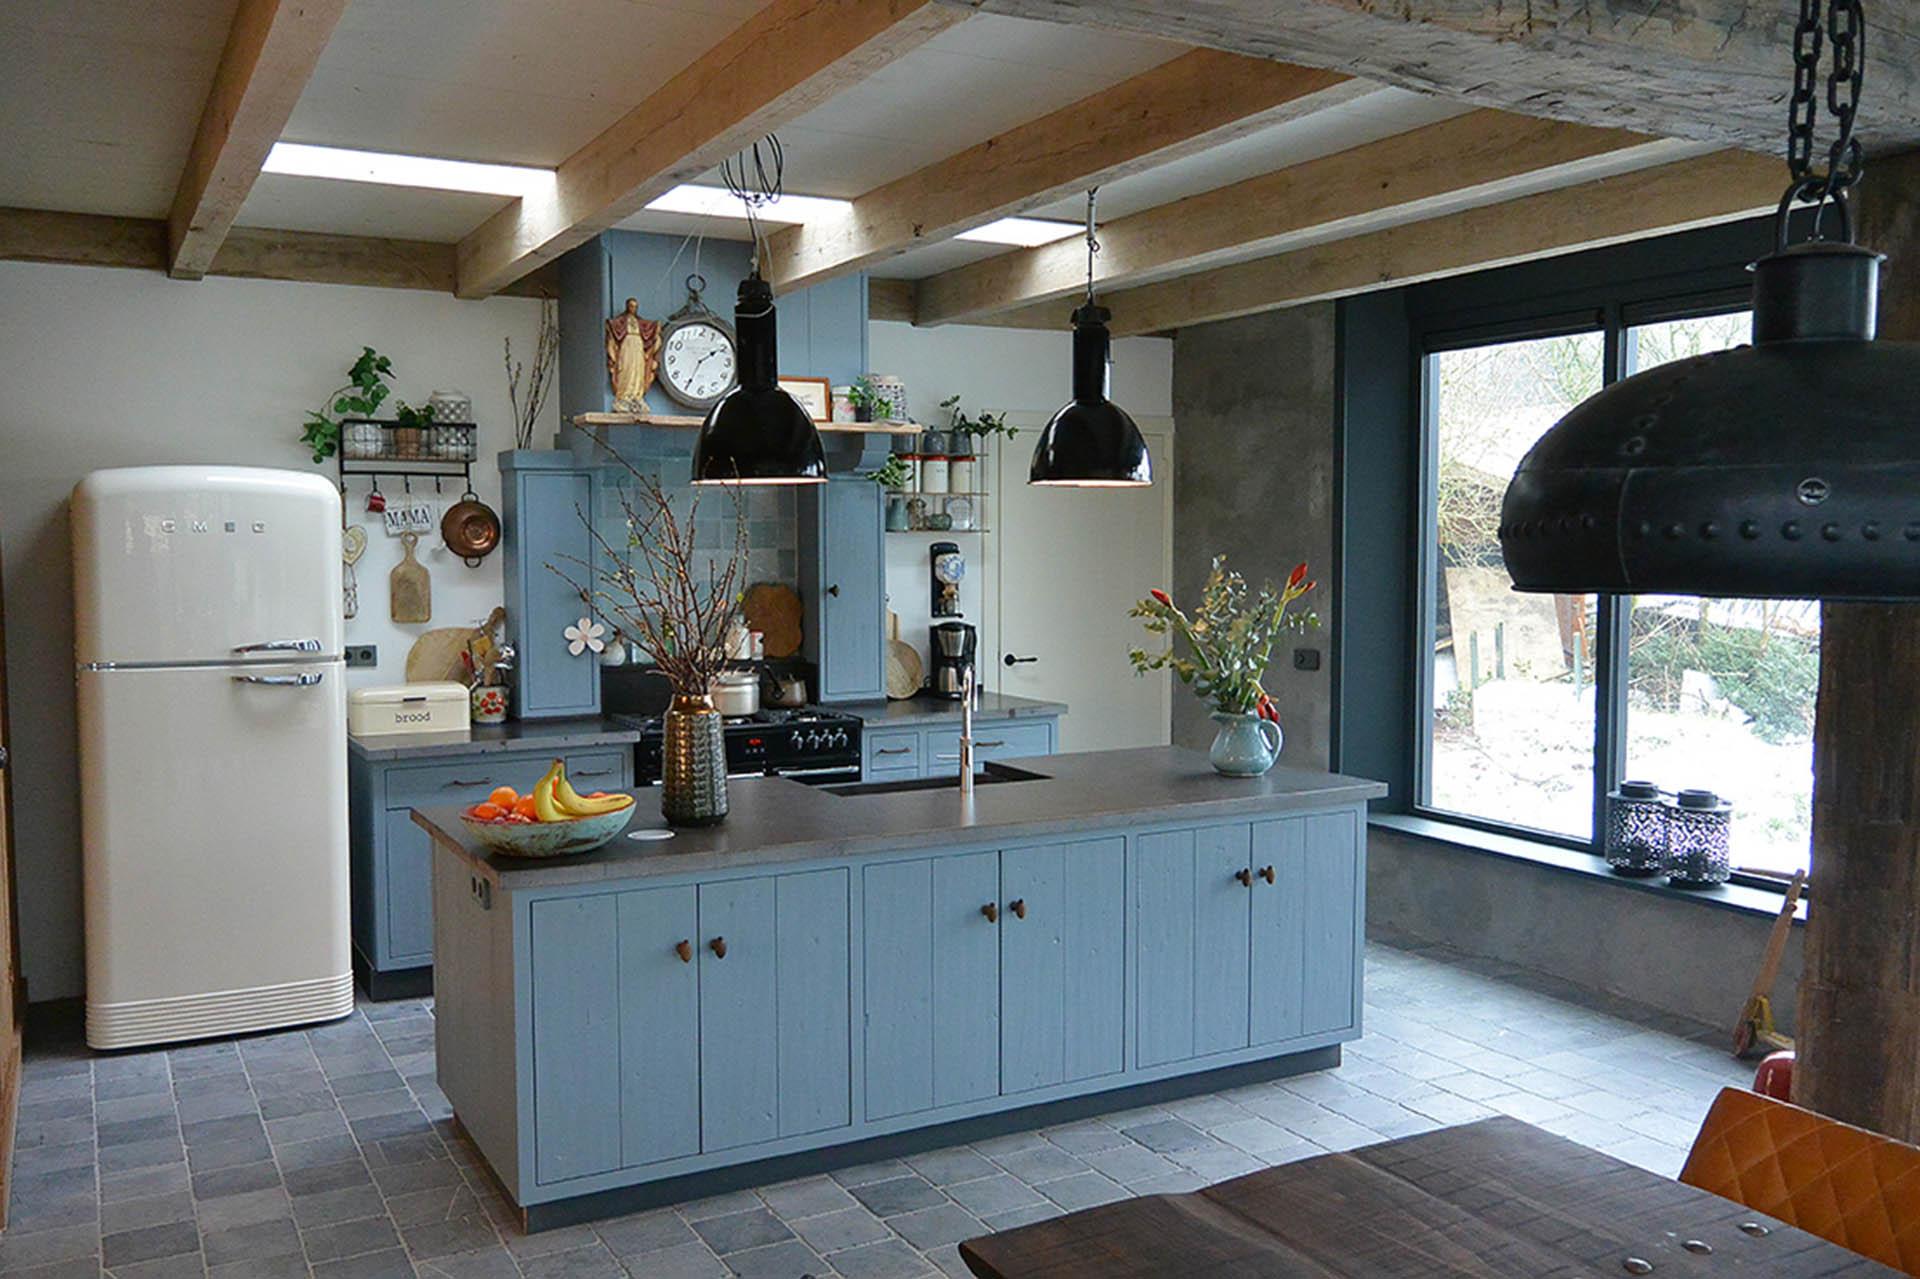 lichte keuken mede door daklicht